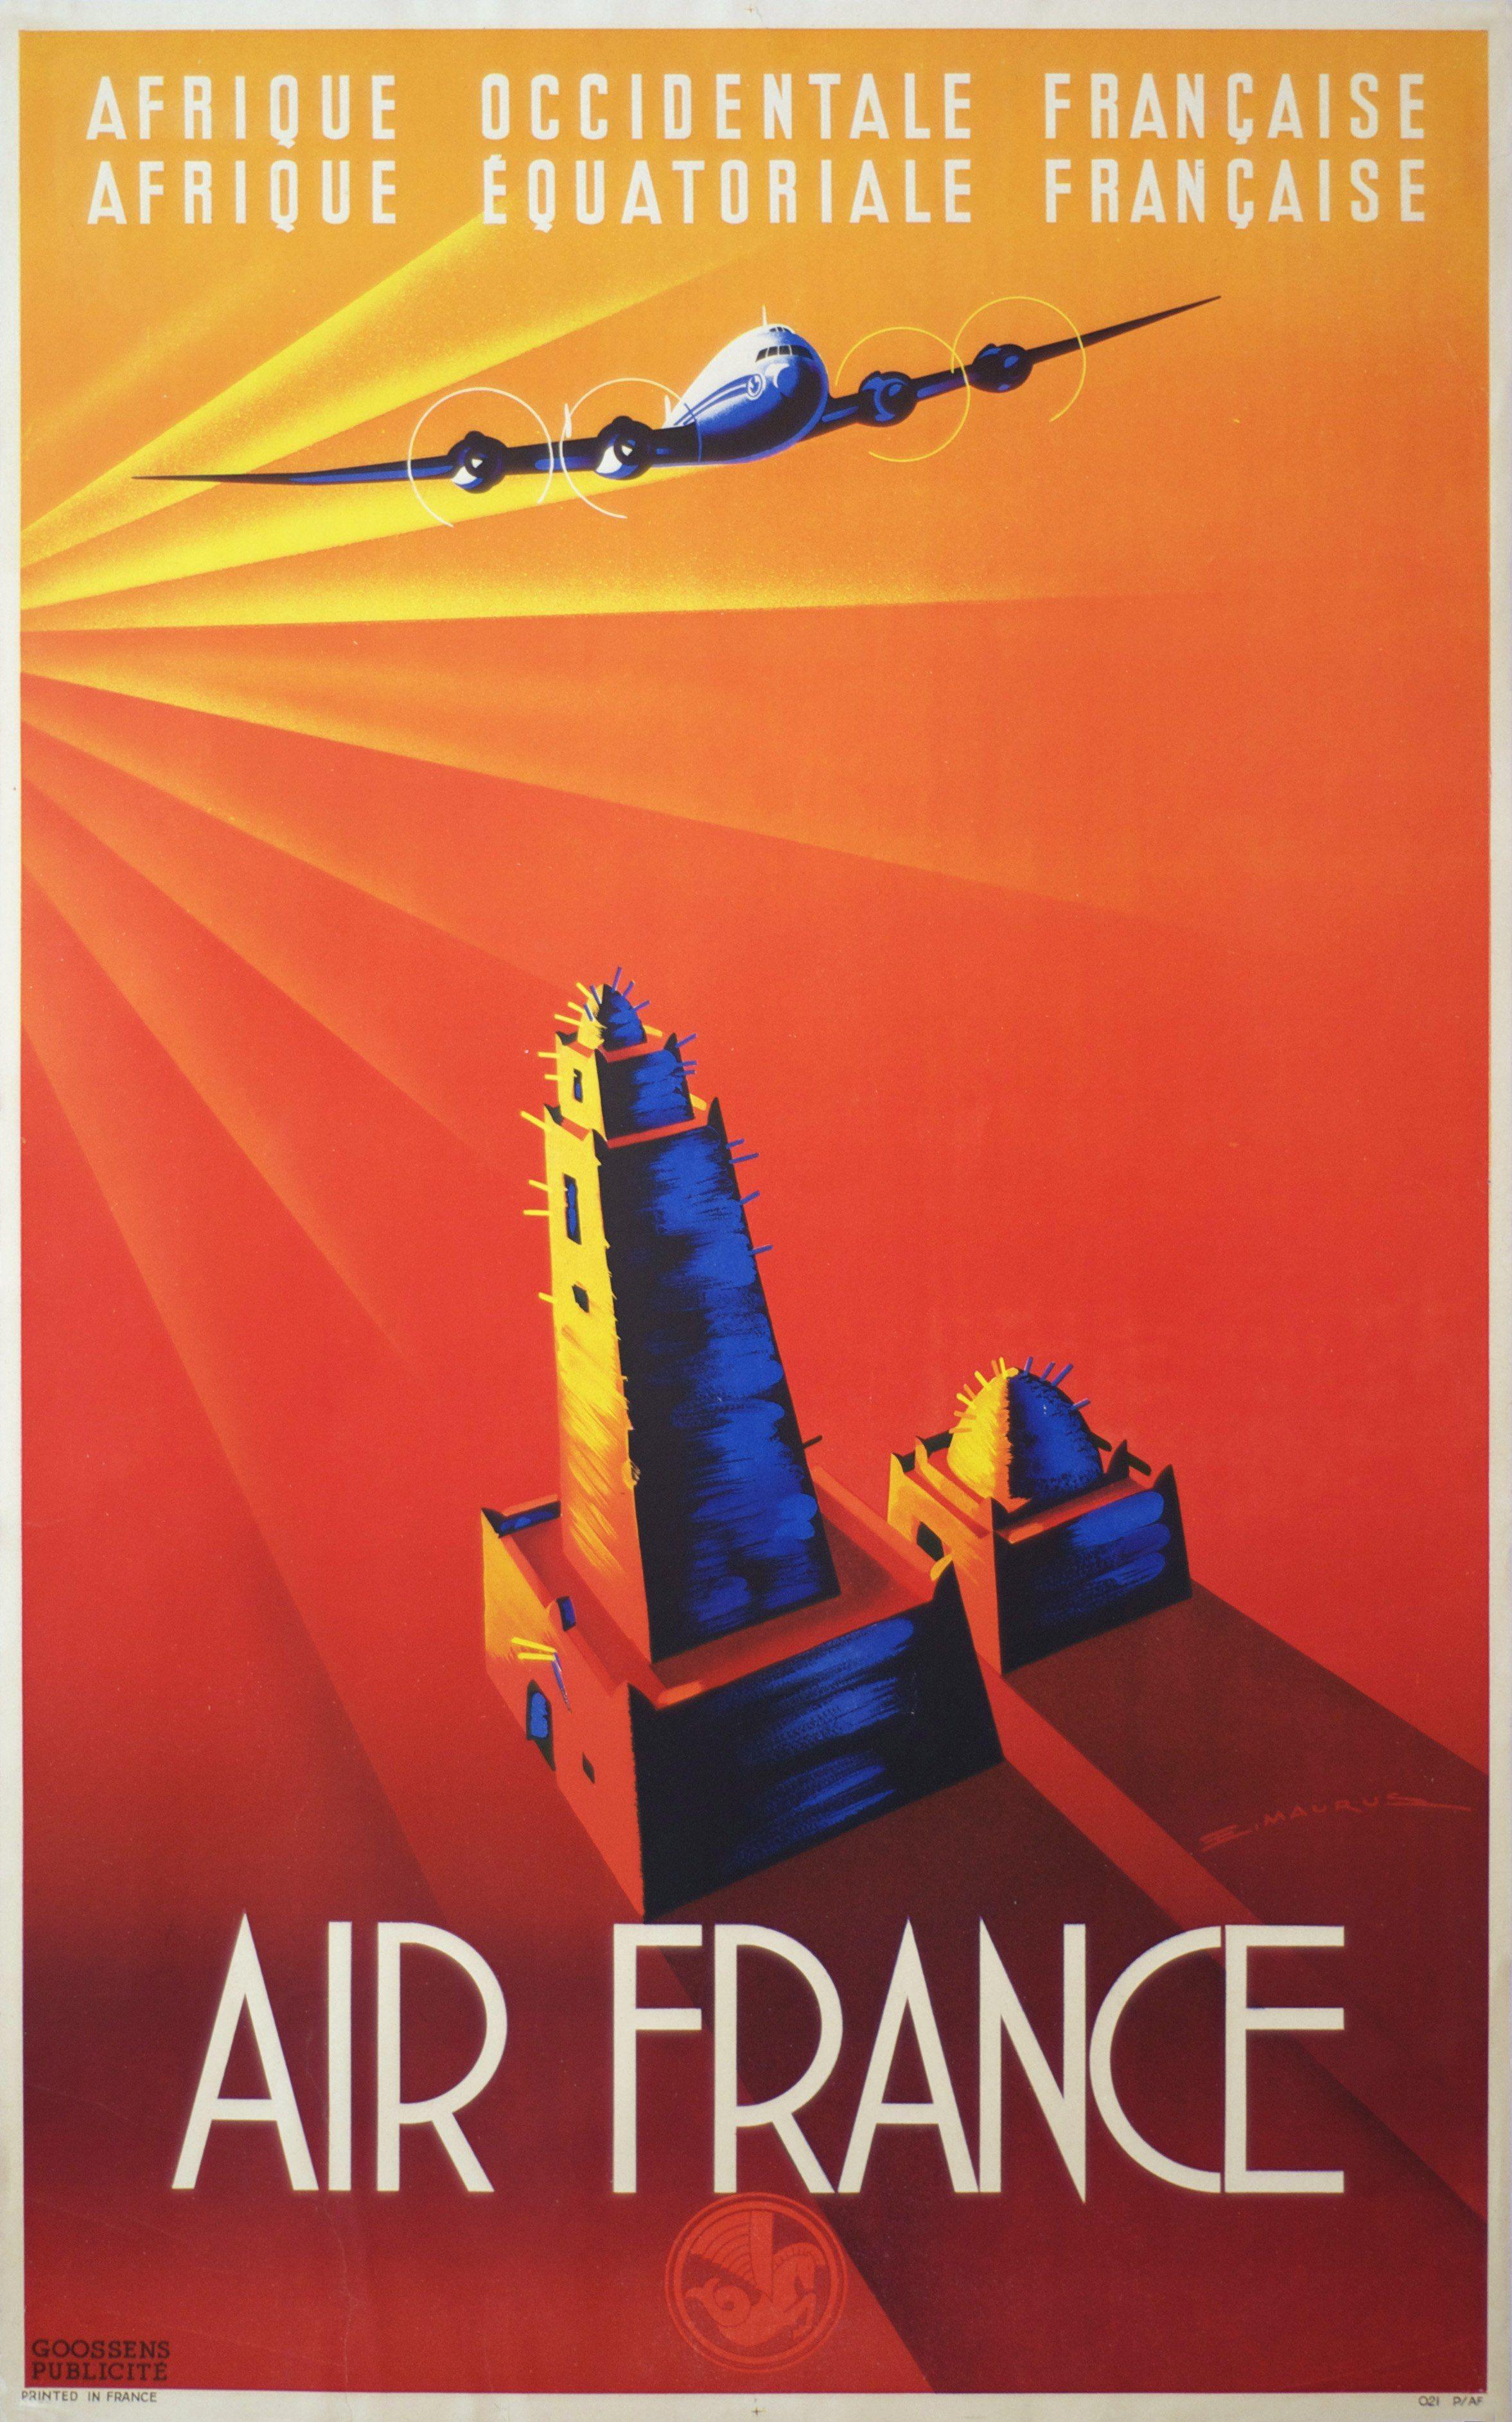 Vintage transportation posters share your